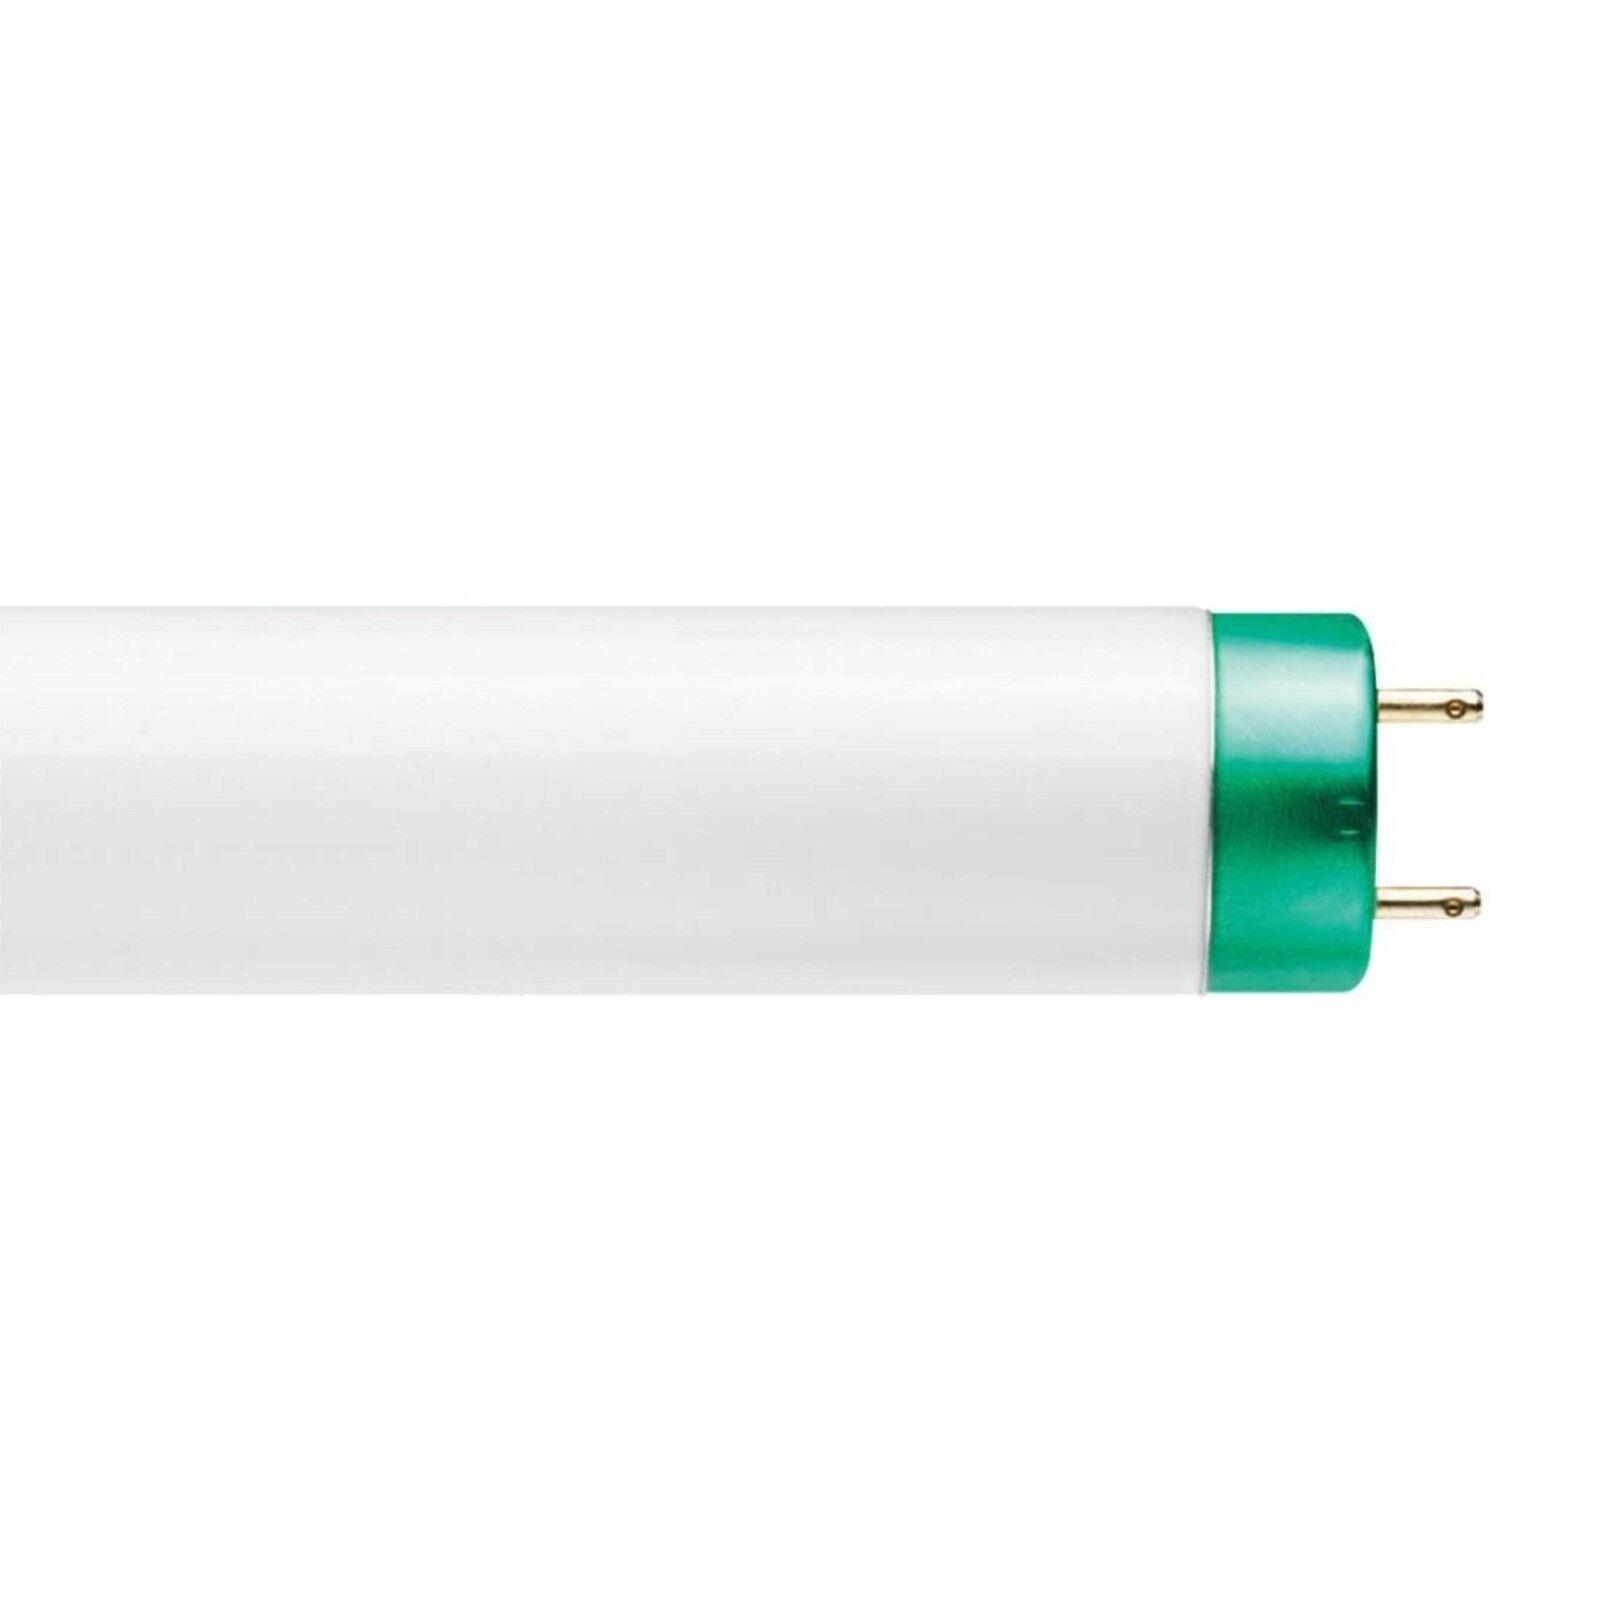 CASE OF 25 PHILIPS F32T8 ADV830 EW ALTO 30W ENERGY 30,000 T8 Light Bulb 4ft